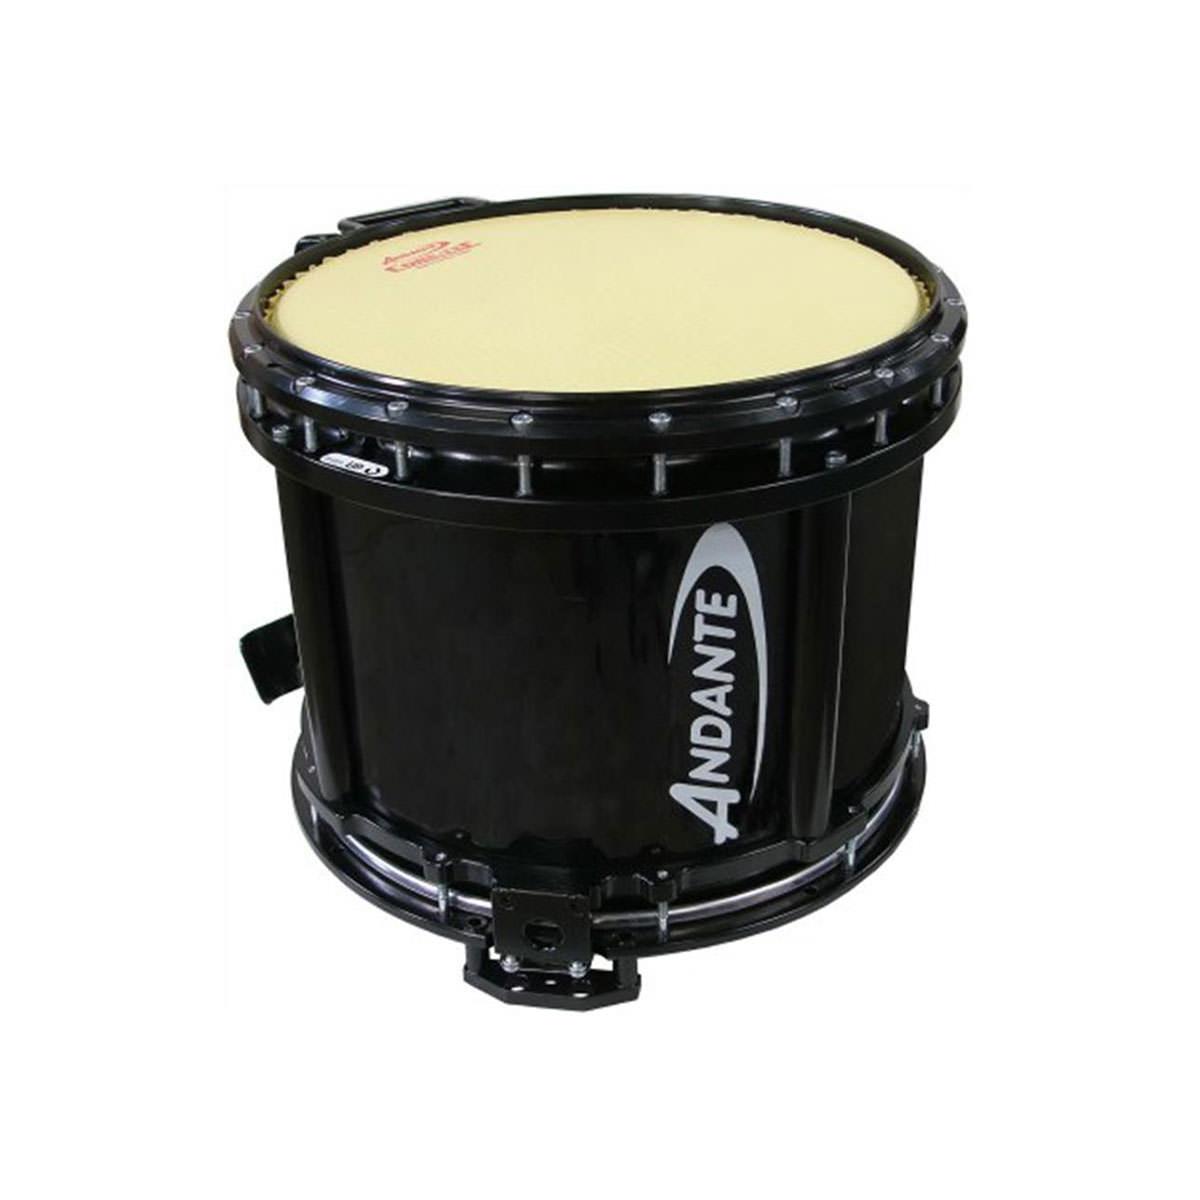 Andante Reactor Snare Drum